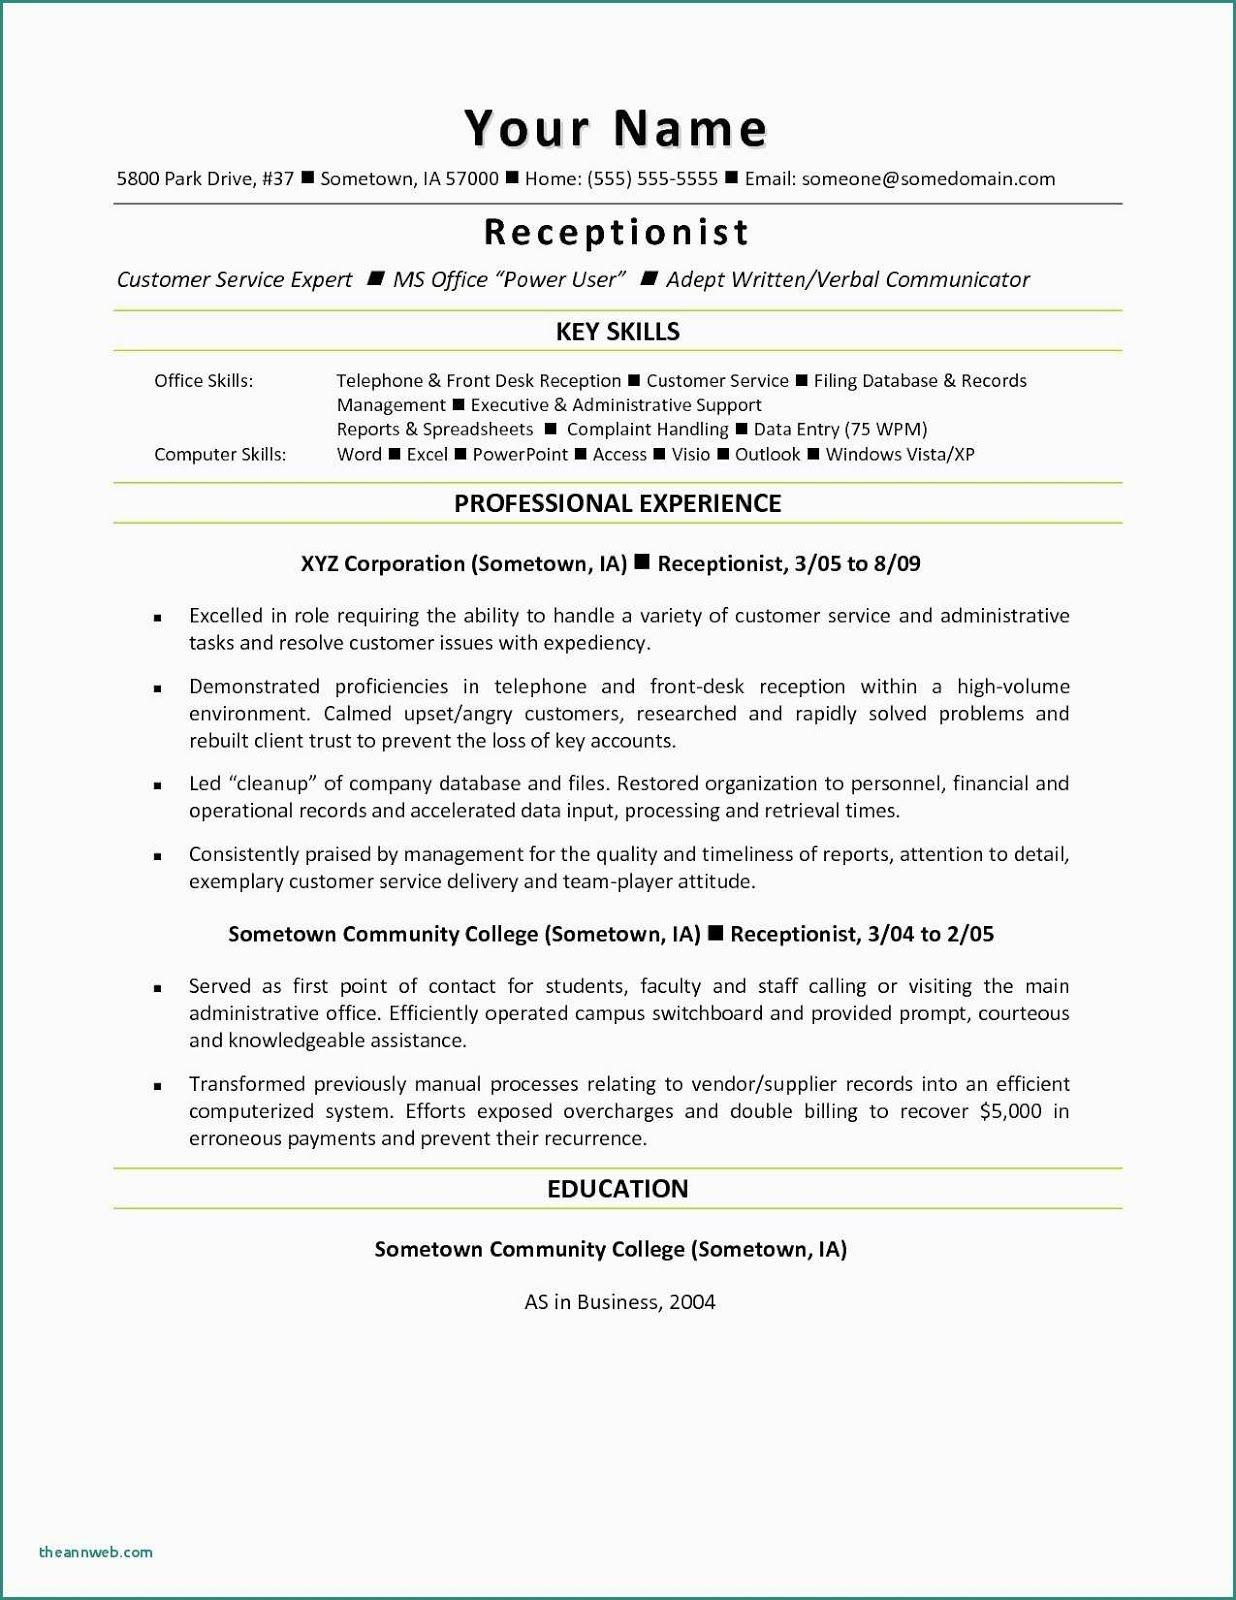 teacher assistant resume sample, teacher assistant resume